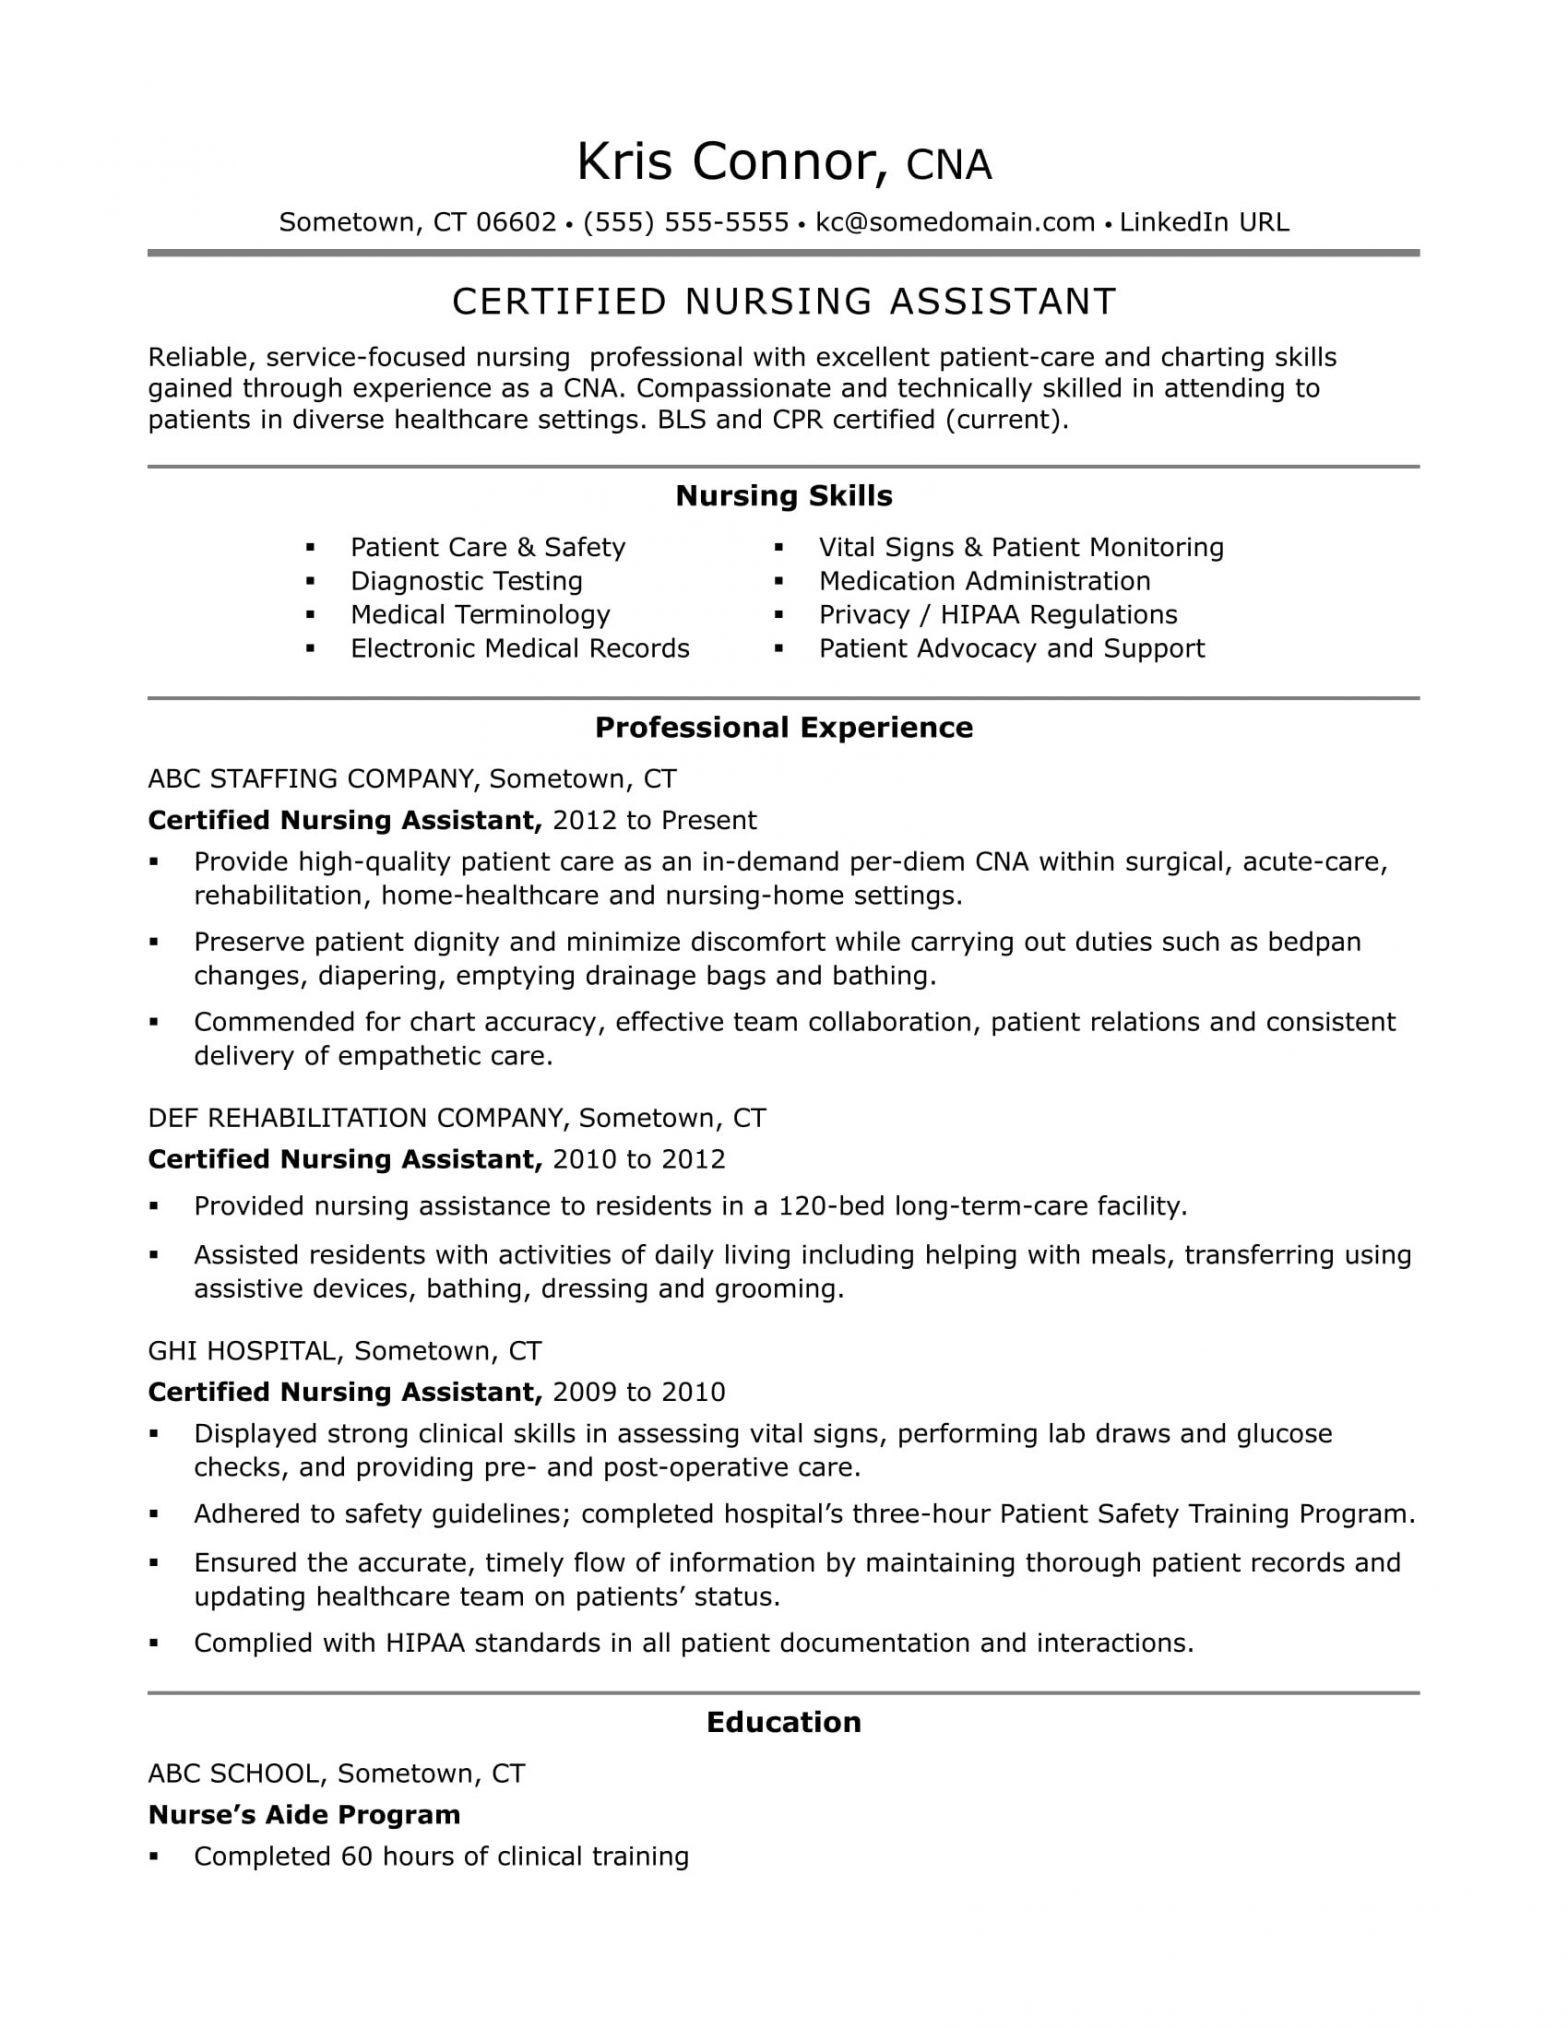 Cna Resume Sample with Hospital Experience Cna Resume Examples: Skills for Cnas Monster.com